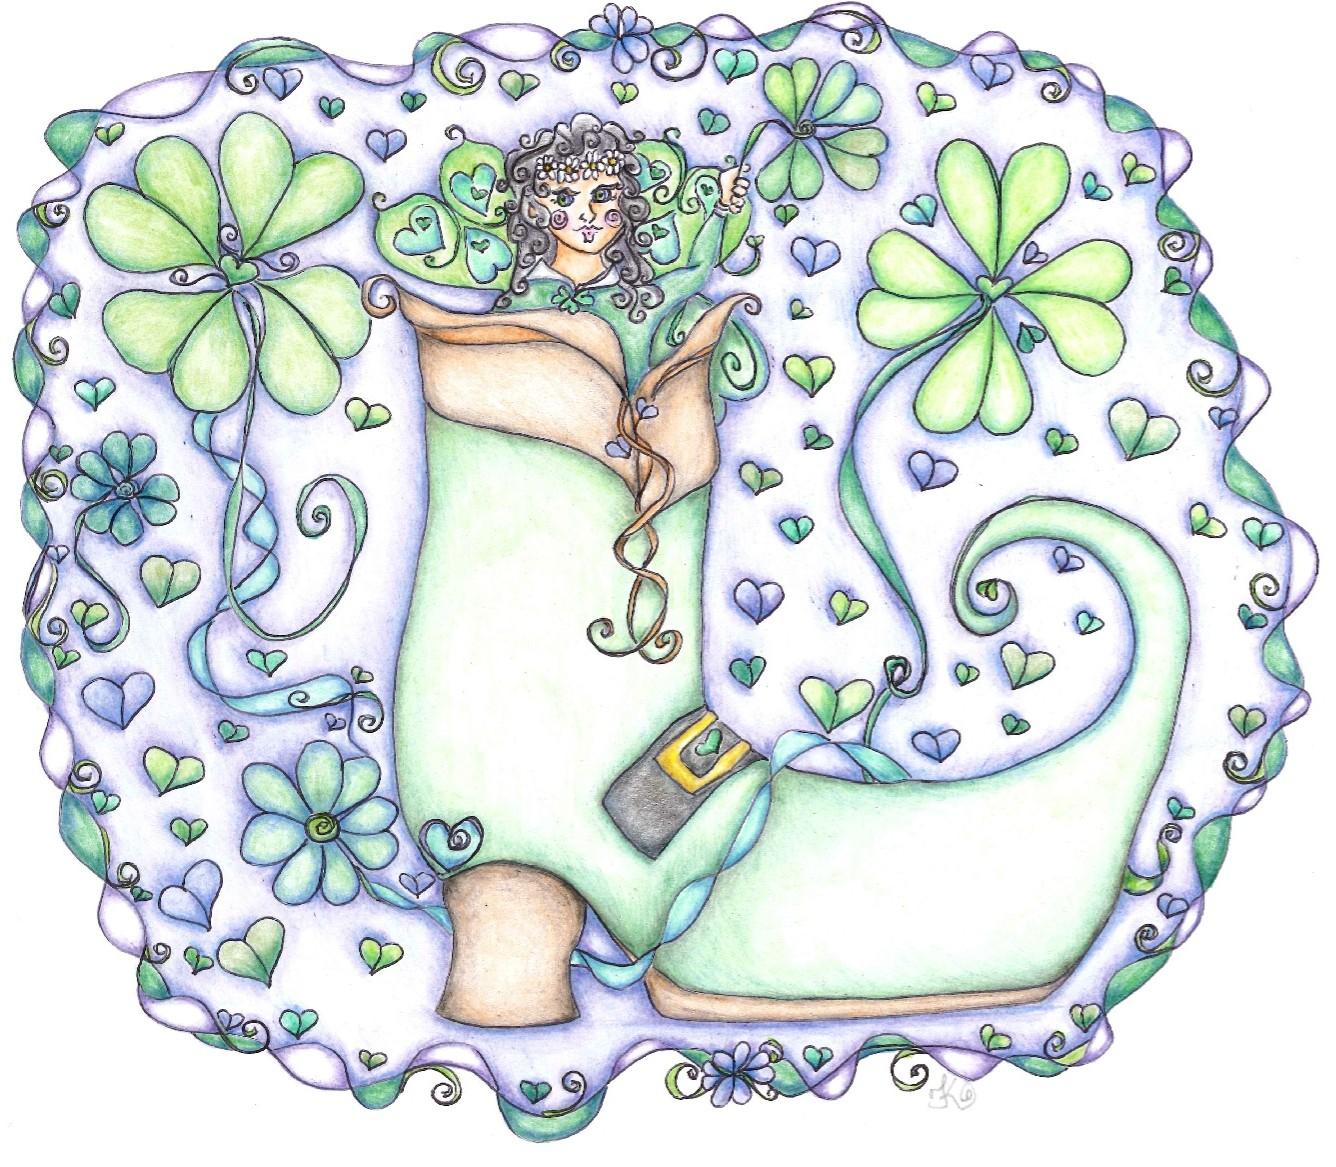 Minnie Clover-001 - Edited.jpg